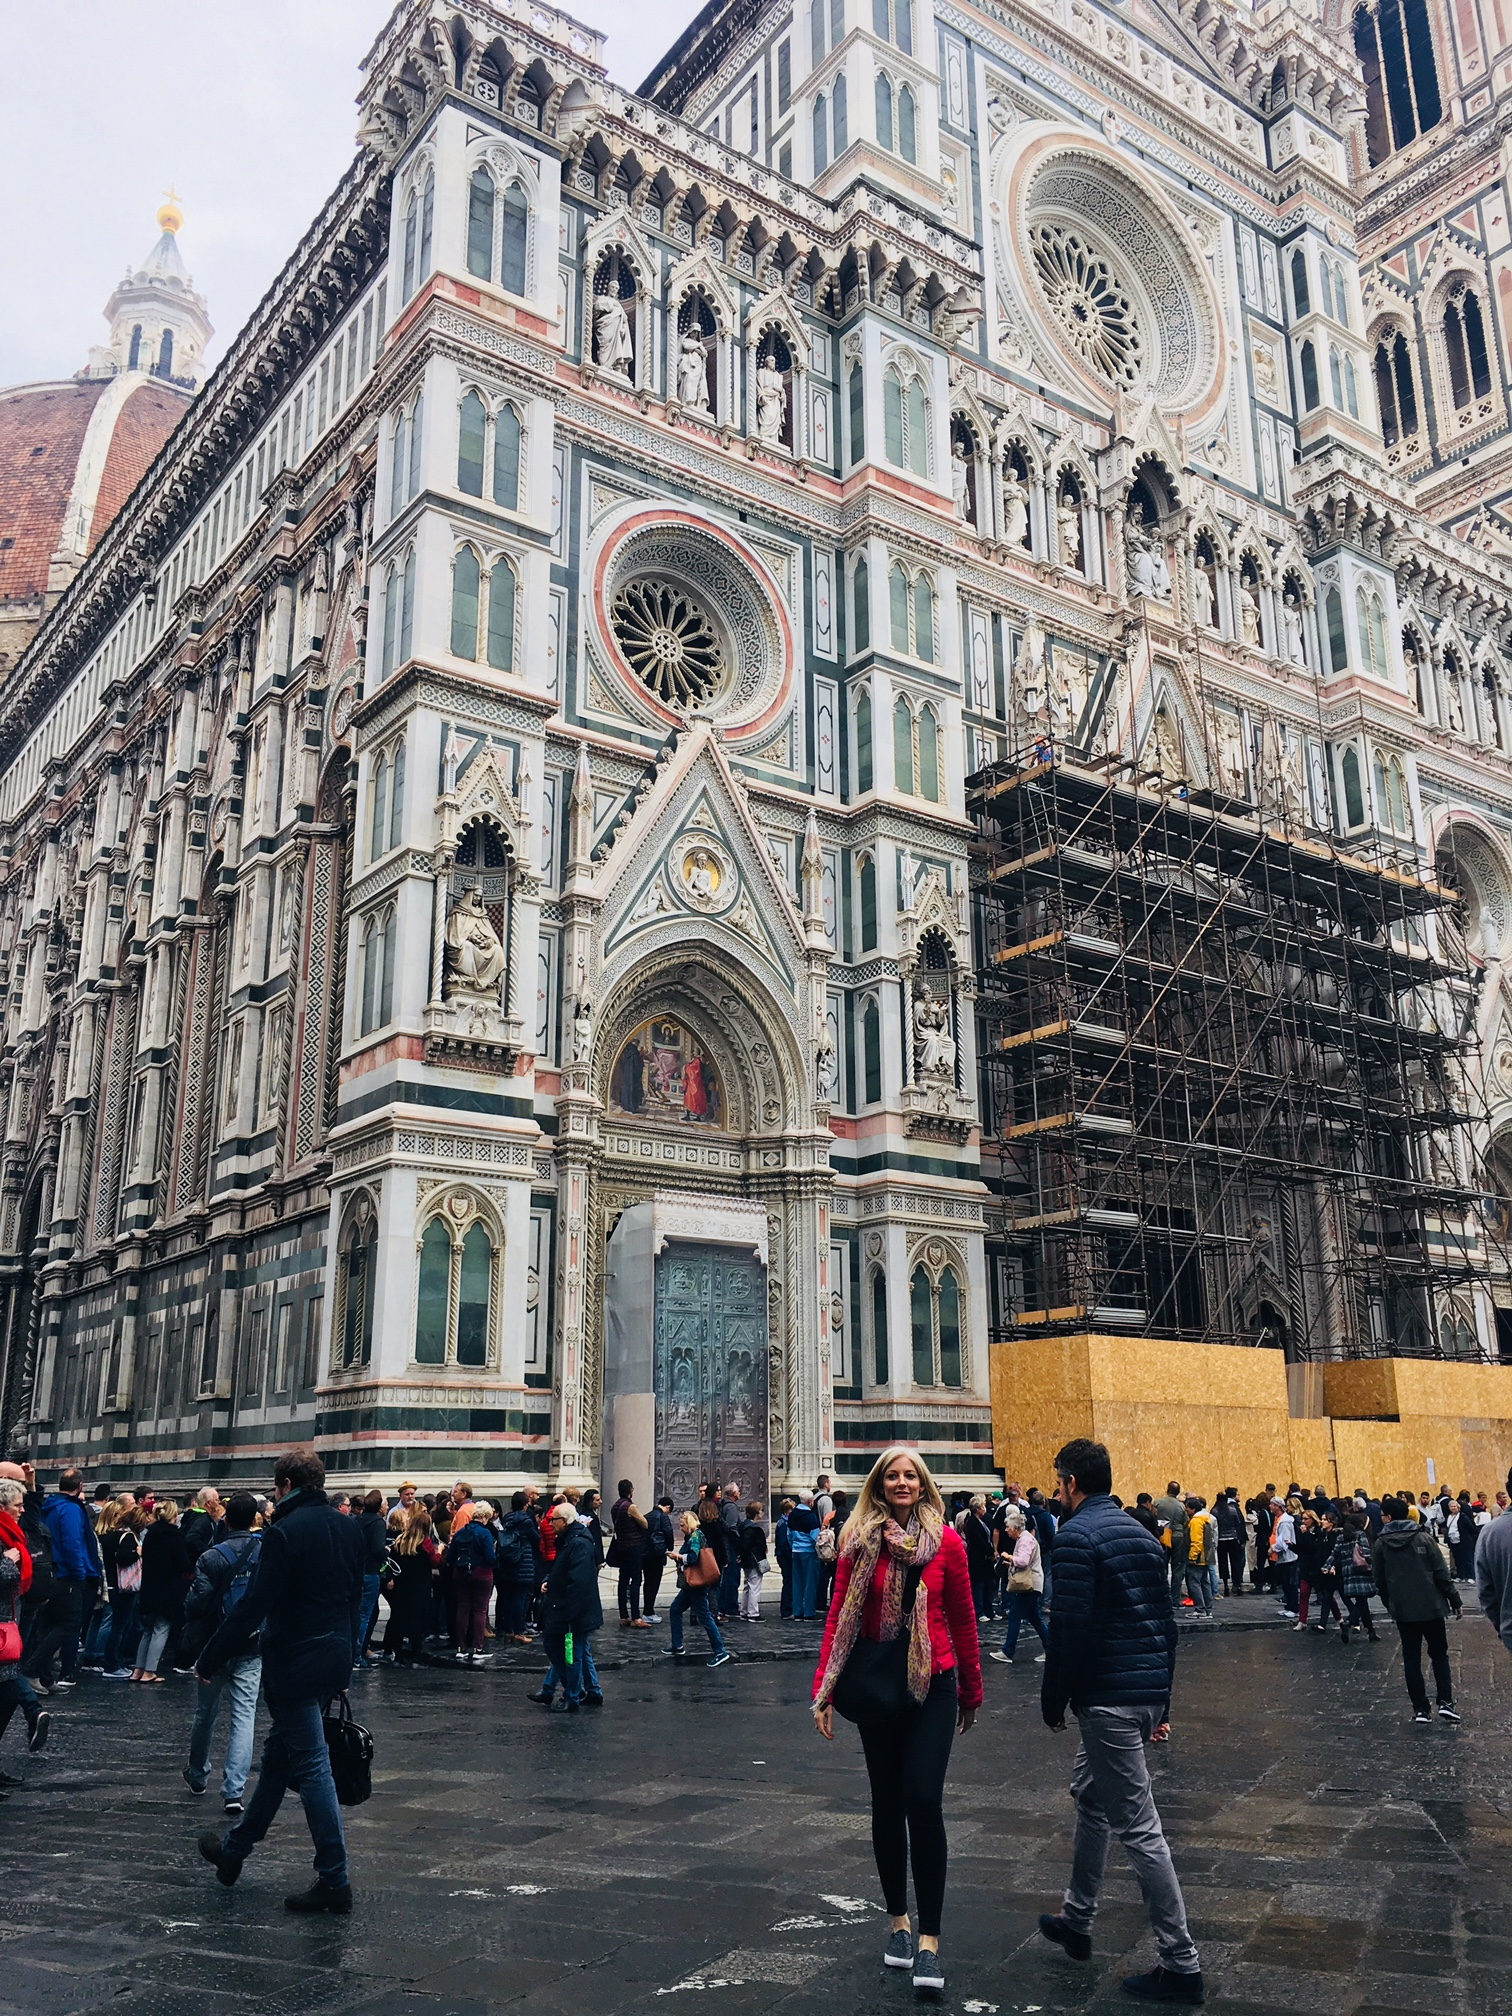 Florence's Piazza del Duomo